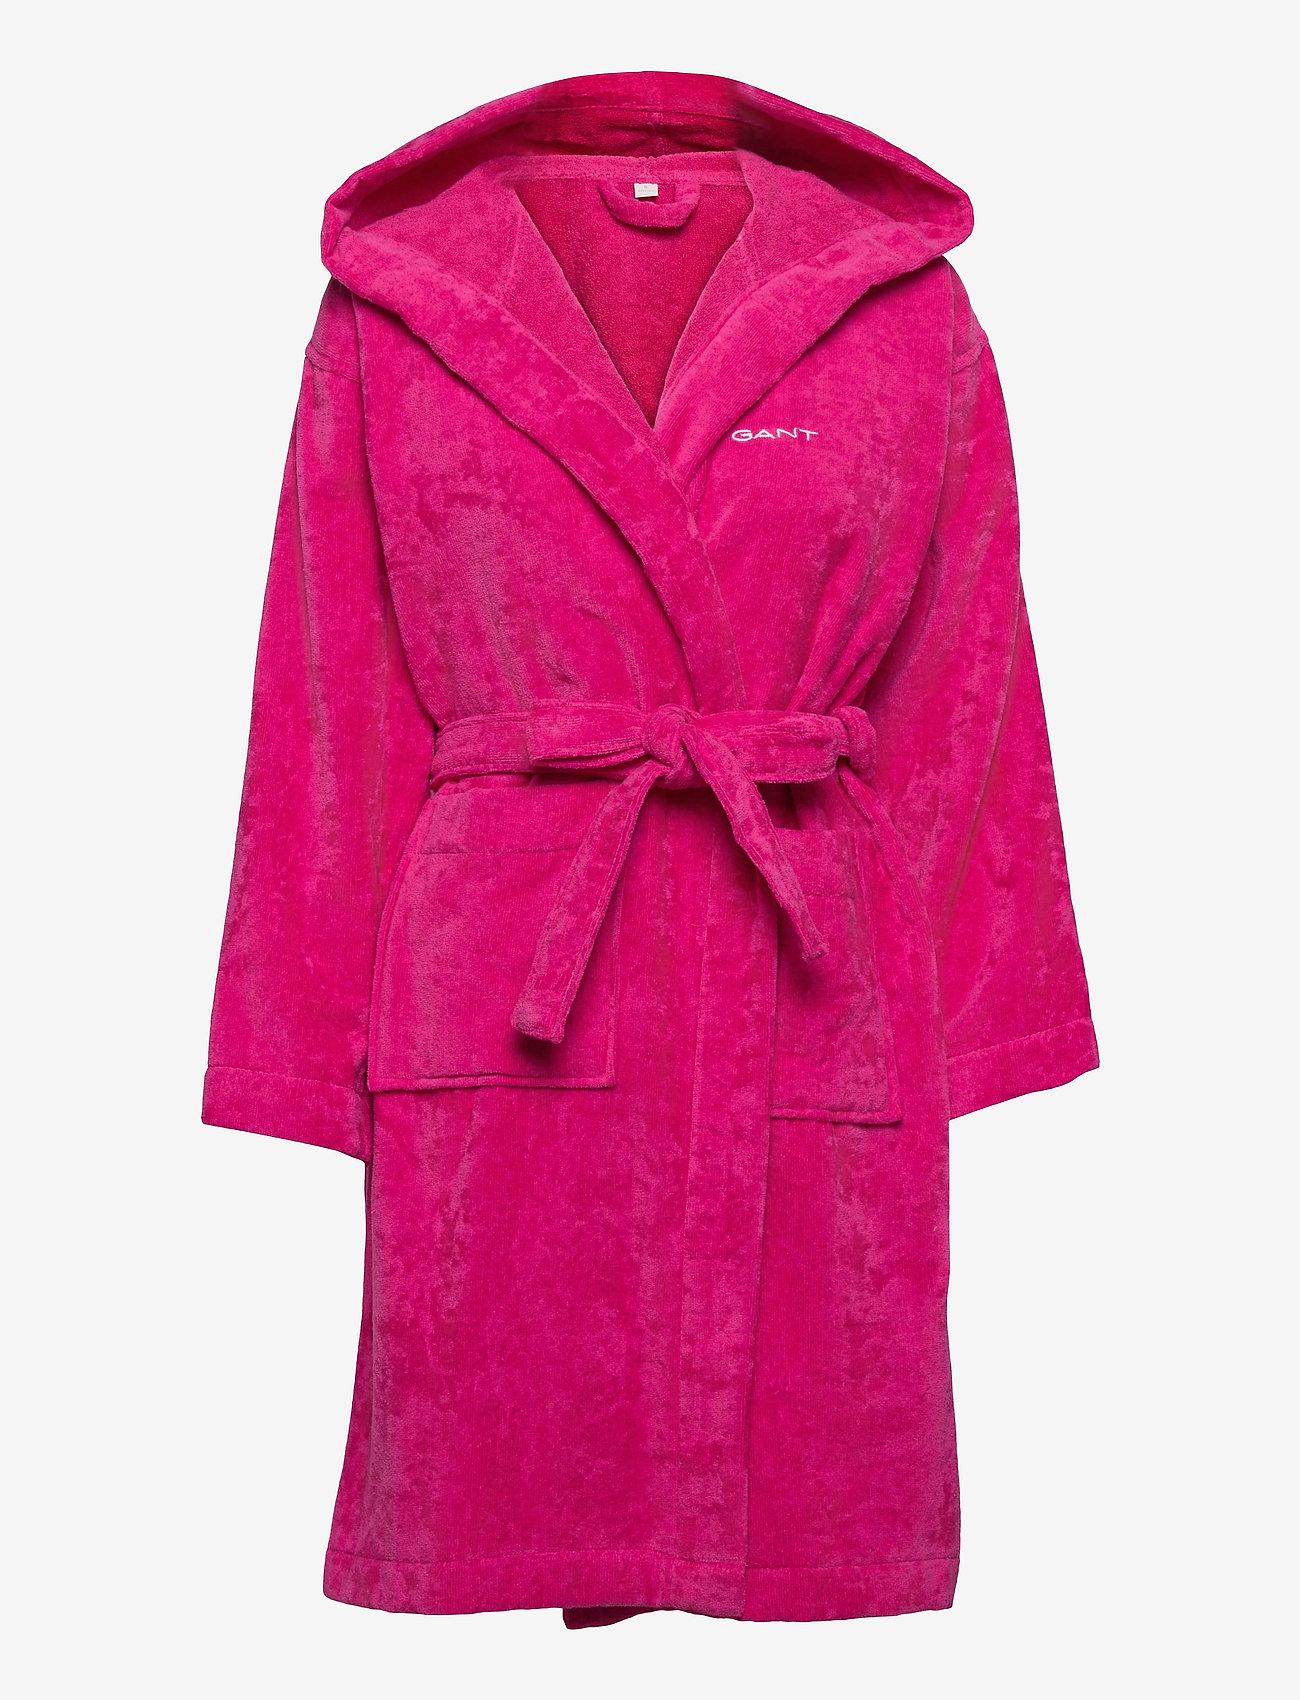 GANT - VACAY ROBE - sous-vêtements - cabaret pink - 0